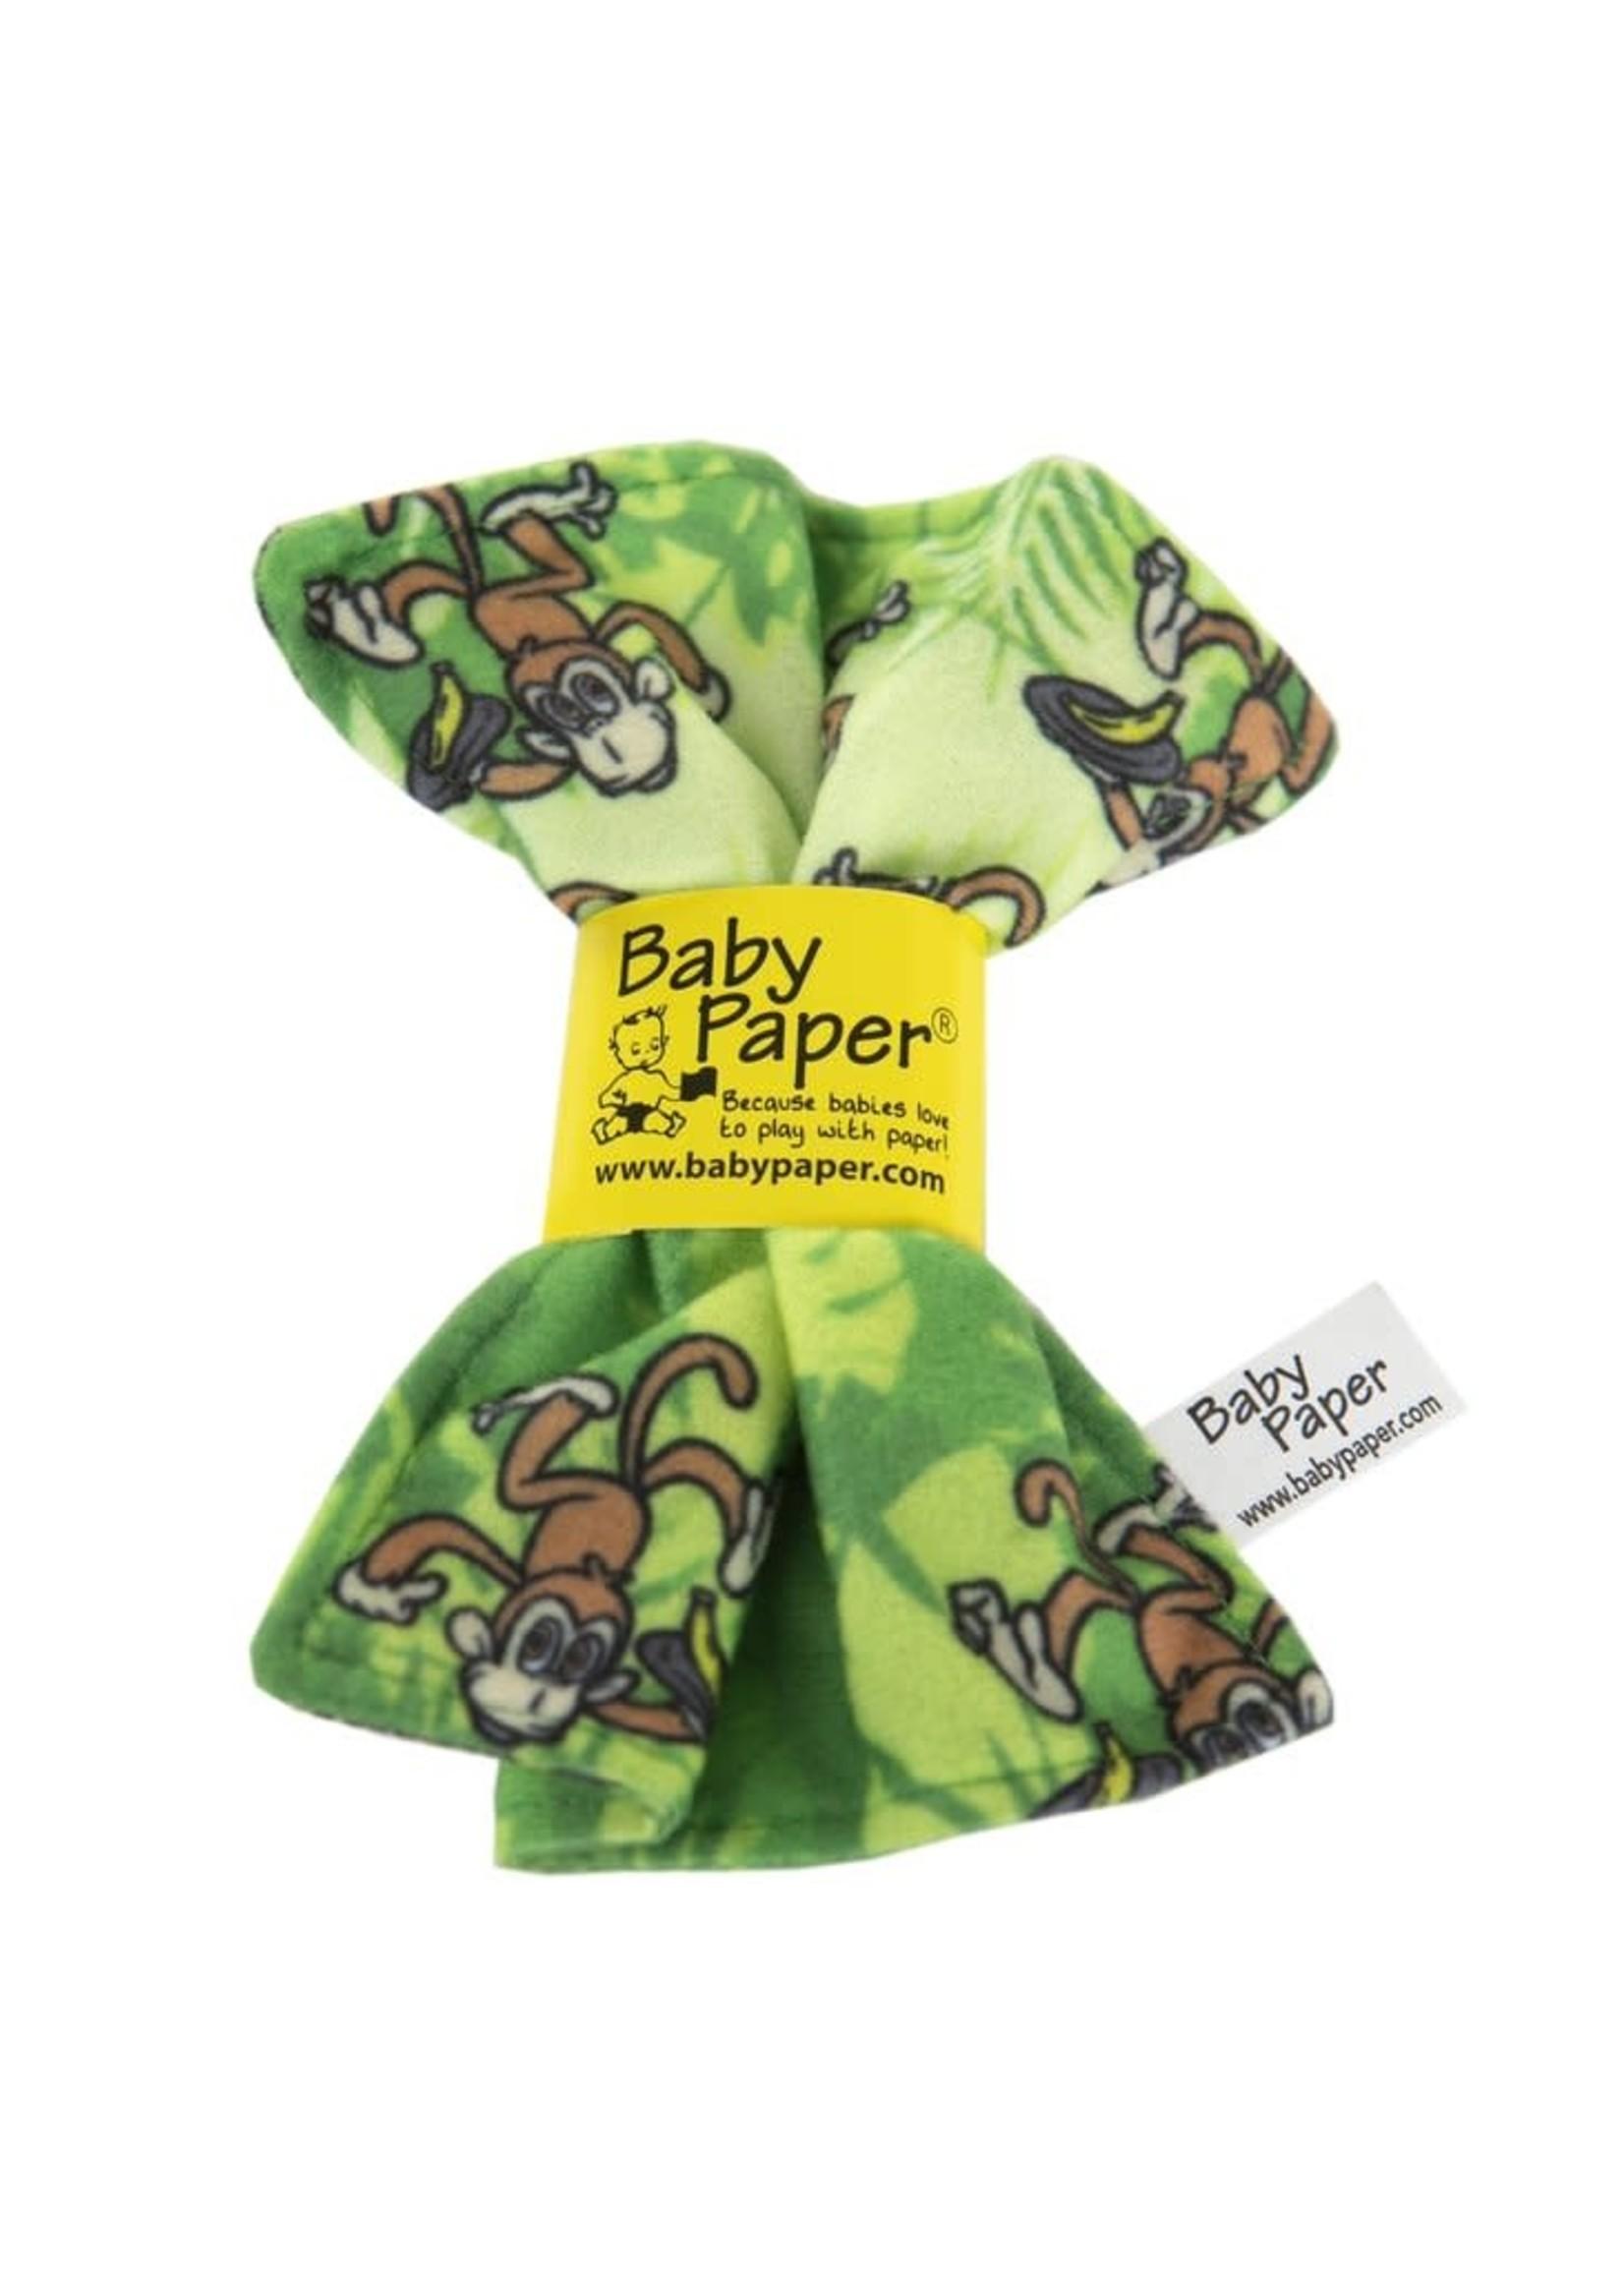 Babypaper (2020)